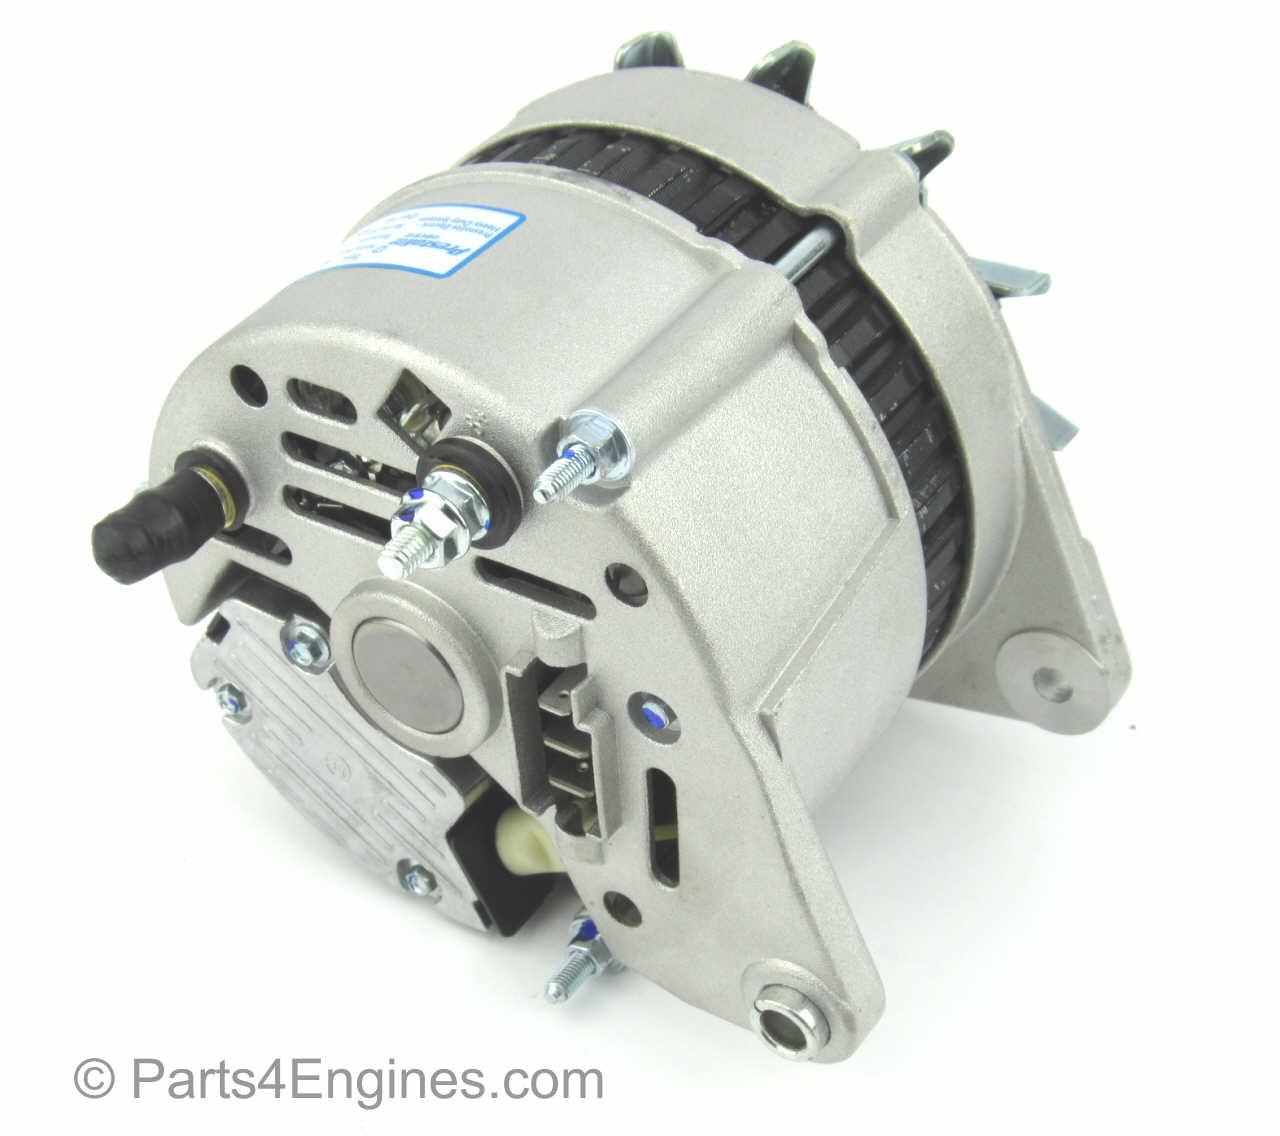 Perkins Prima M80t Alternator Series 100 Wiring Diagram 70amp Rear From